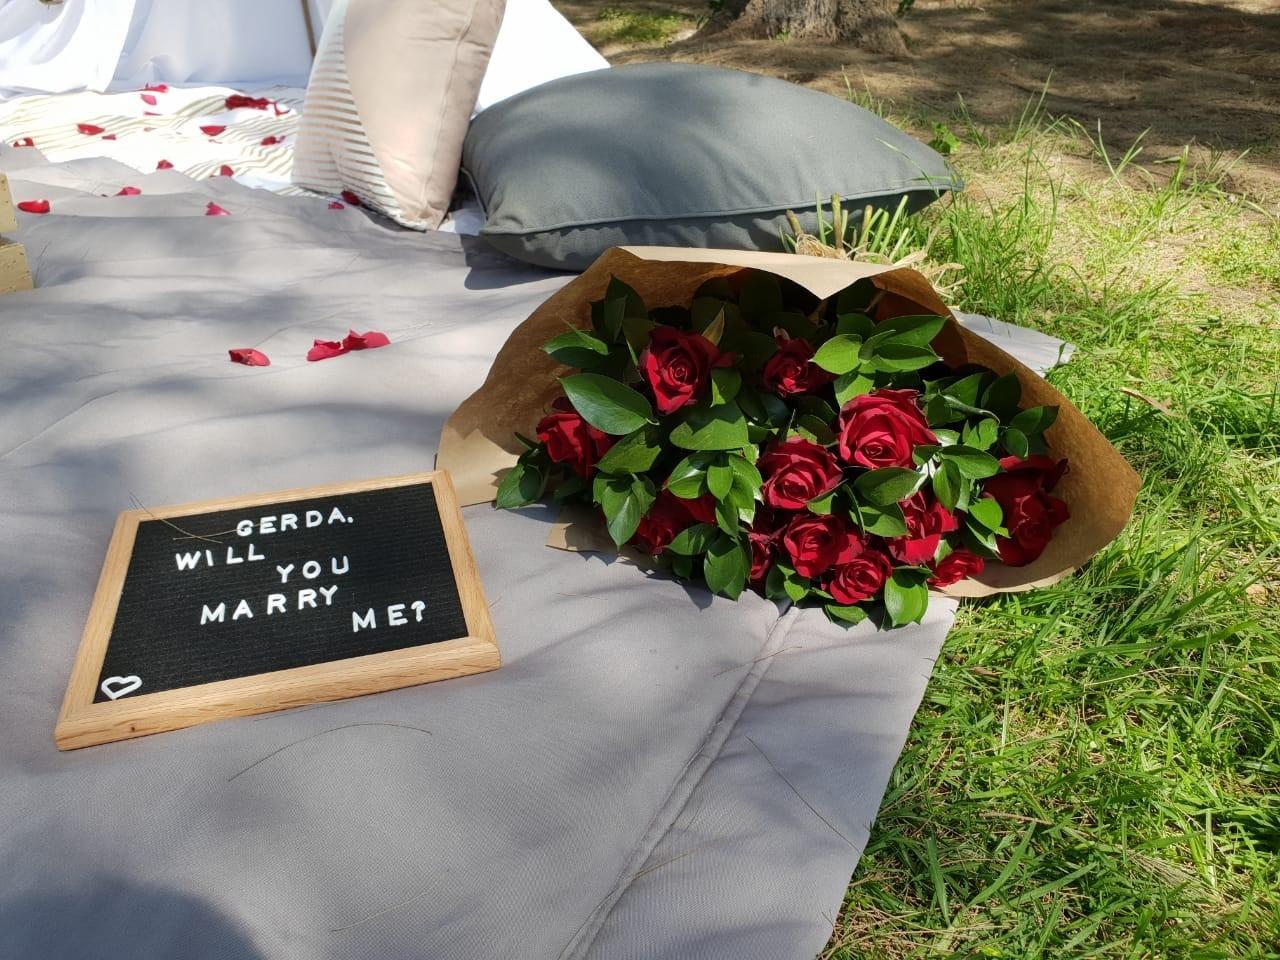 Jose and Gerdas picnic proposal in Johannesburg